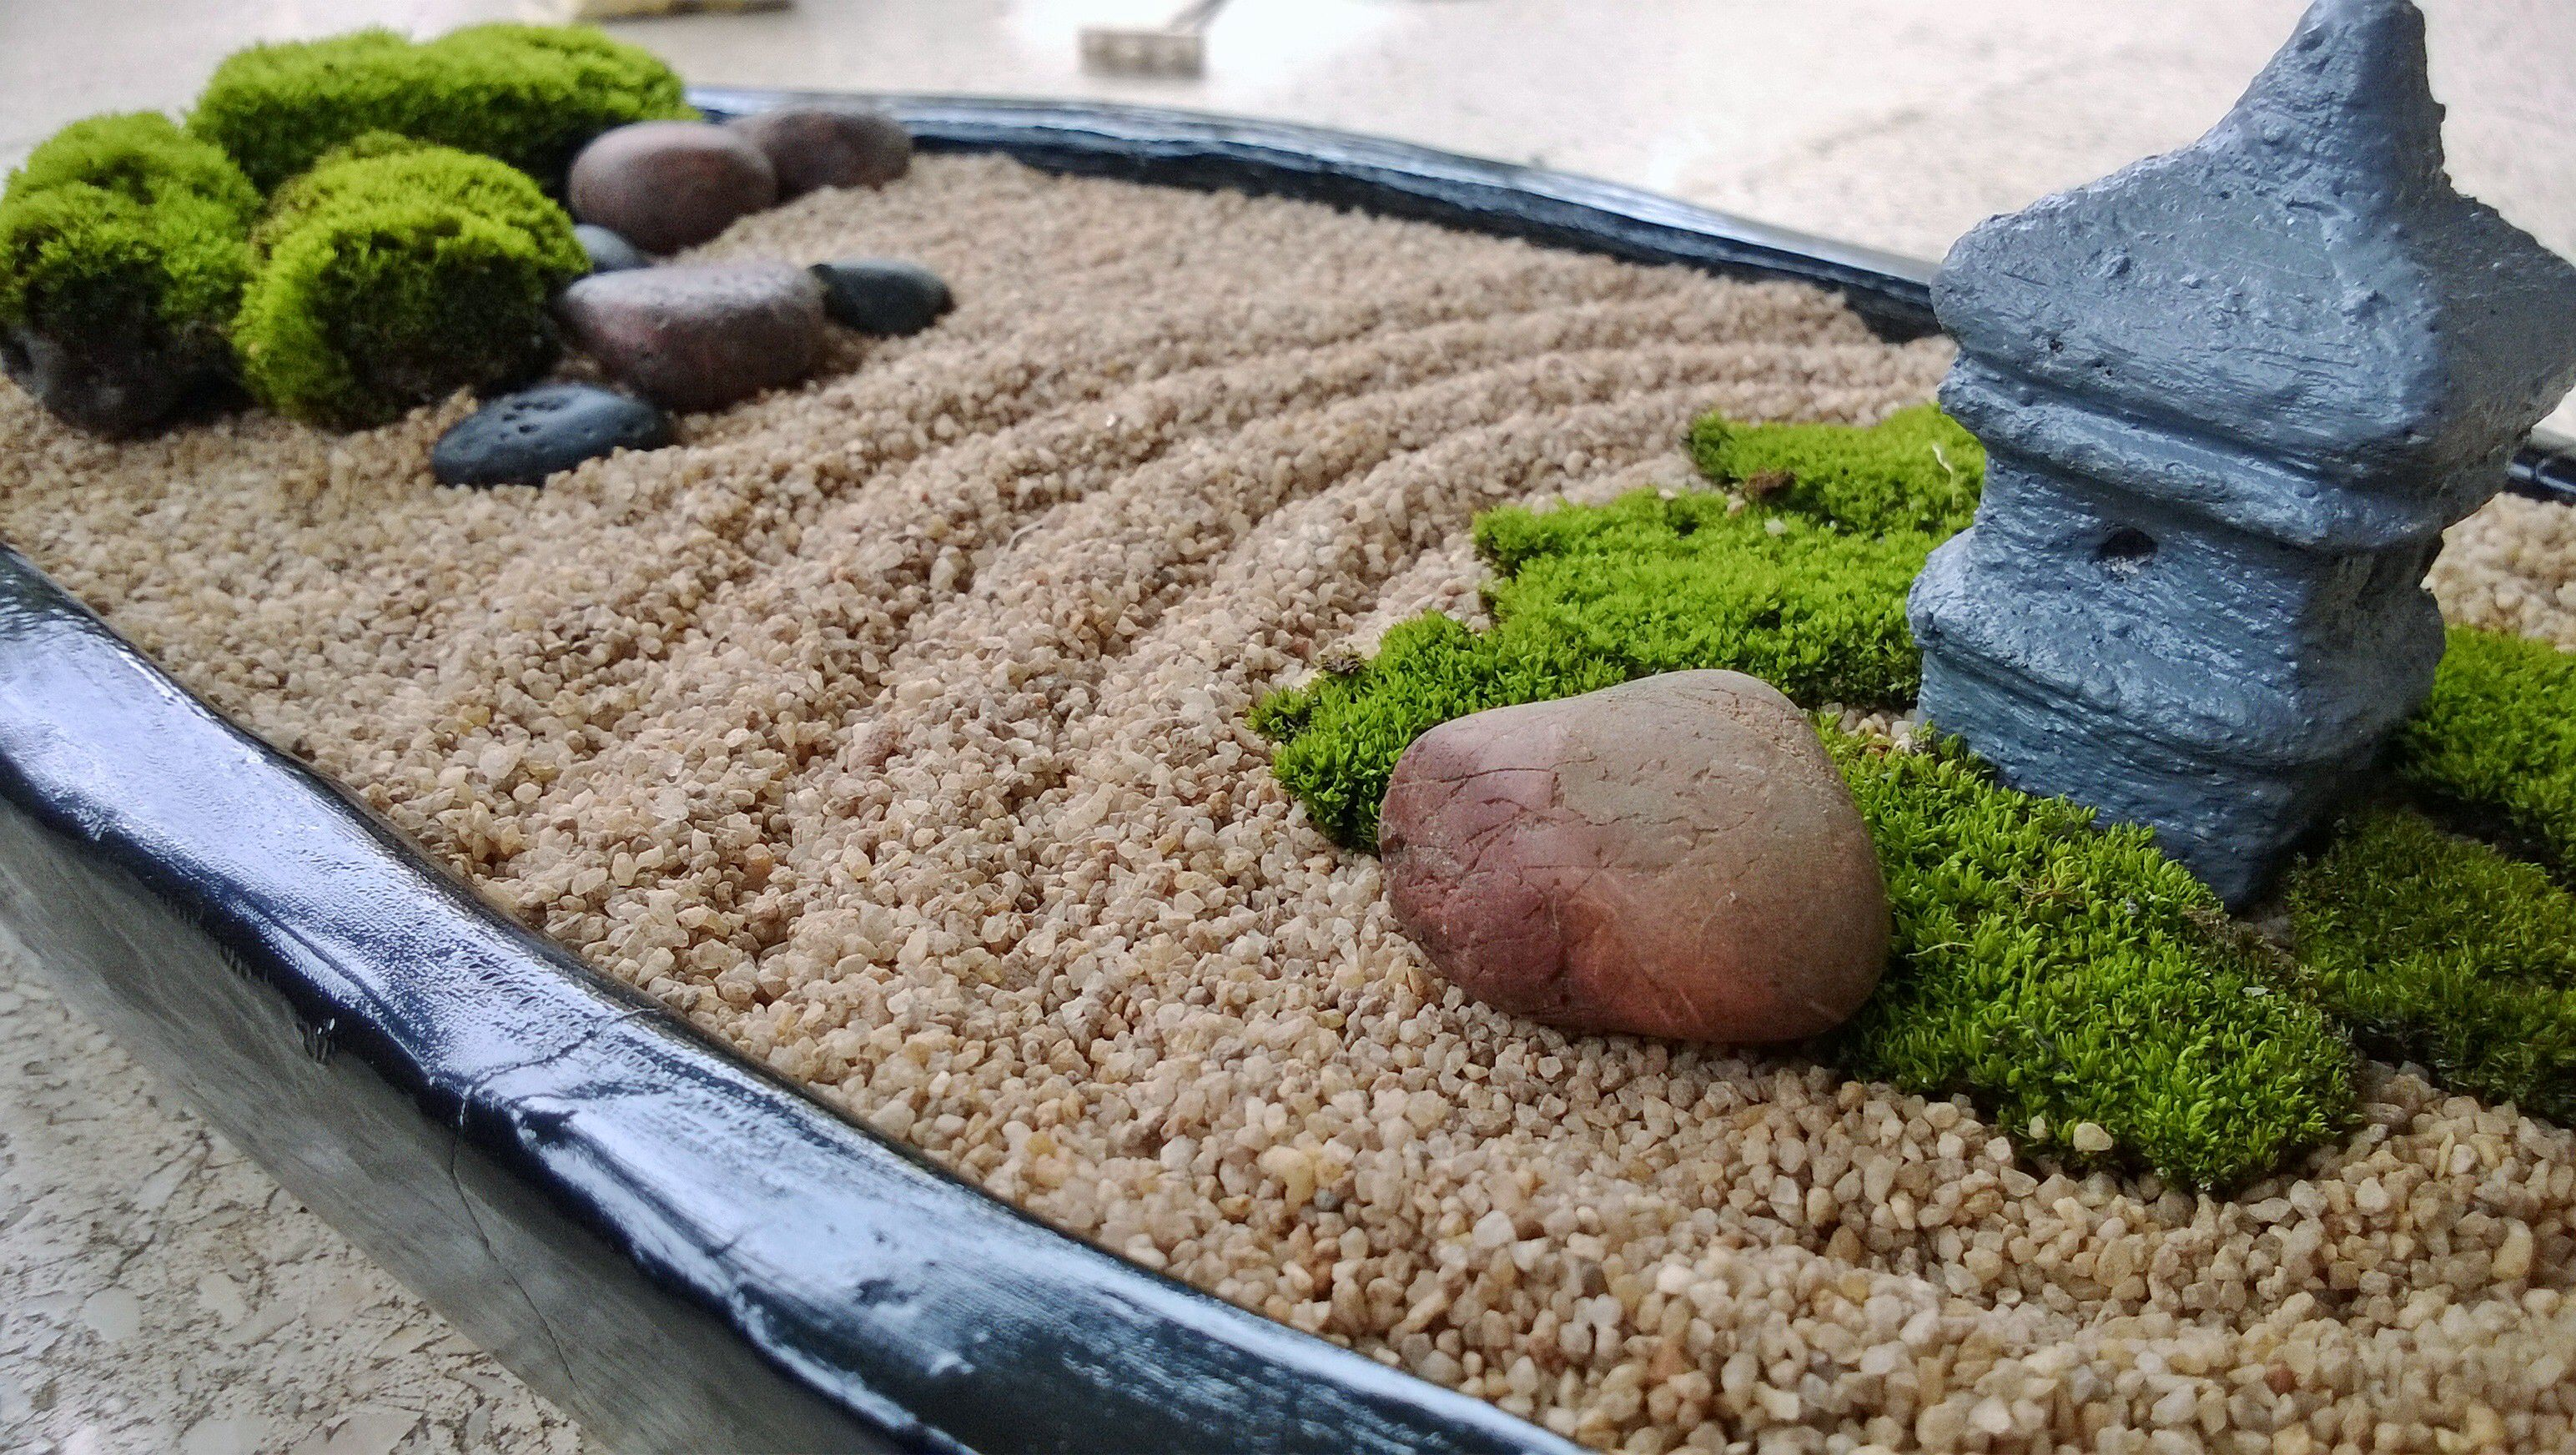 1000 images about zen garden on pinterest zen gardens. Black Bedroom Furniture Sets. Home Design Ideas